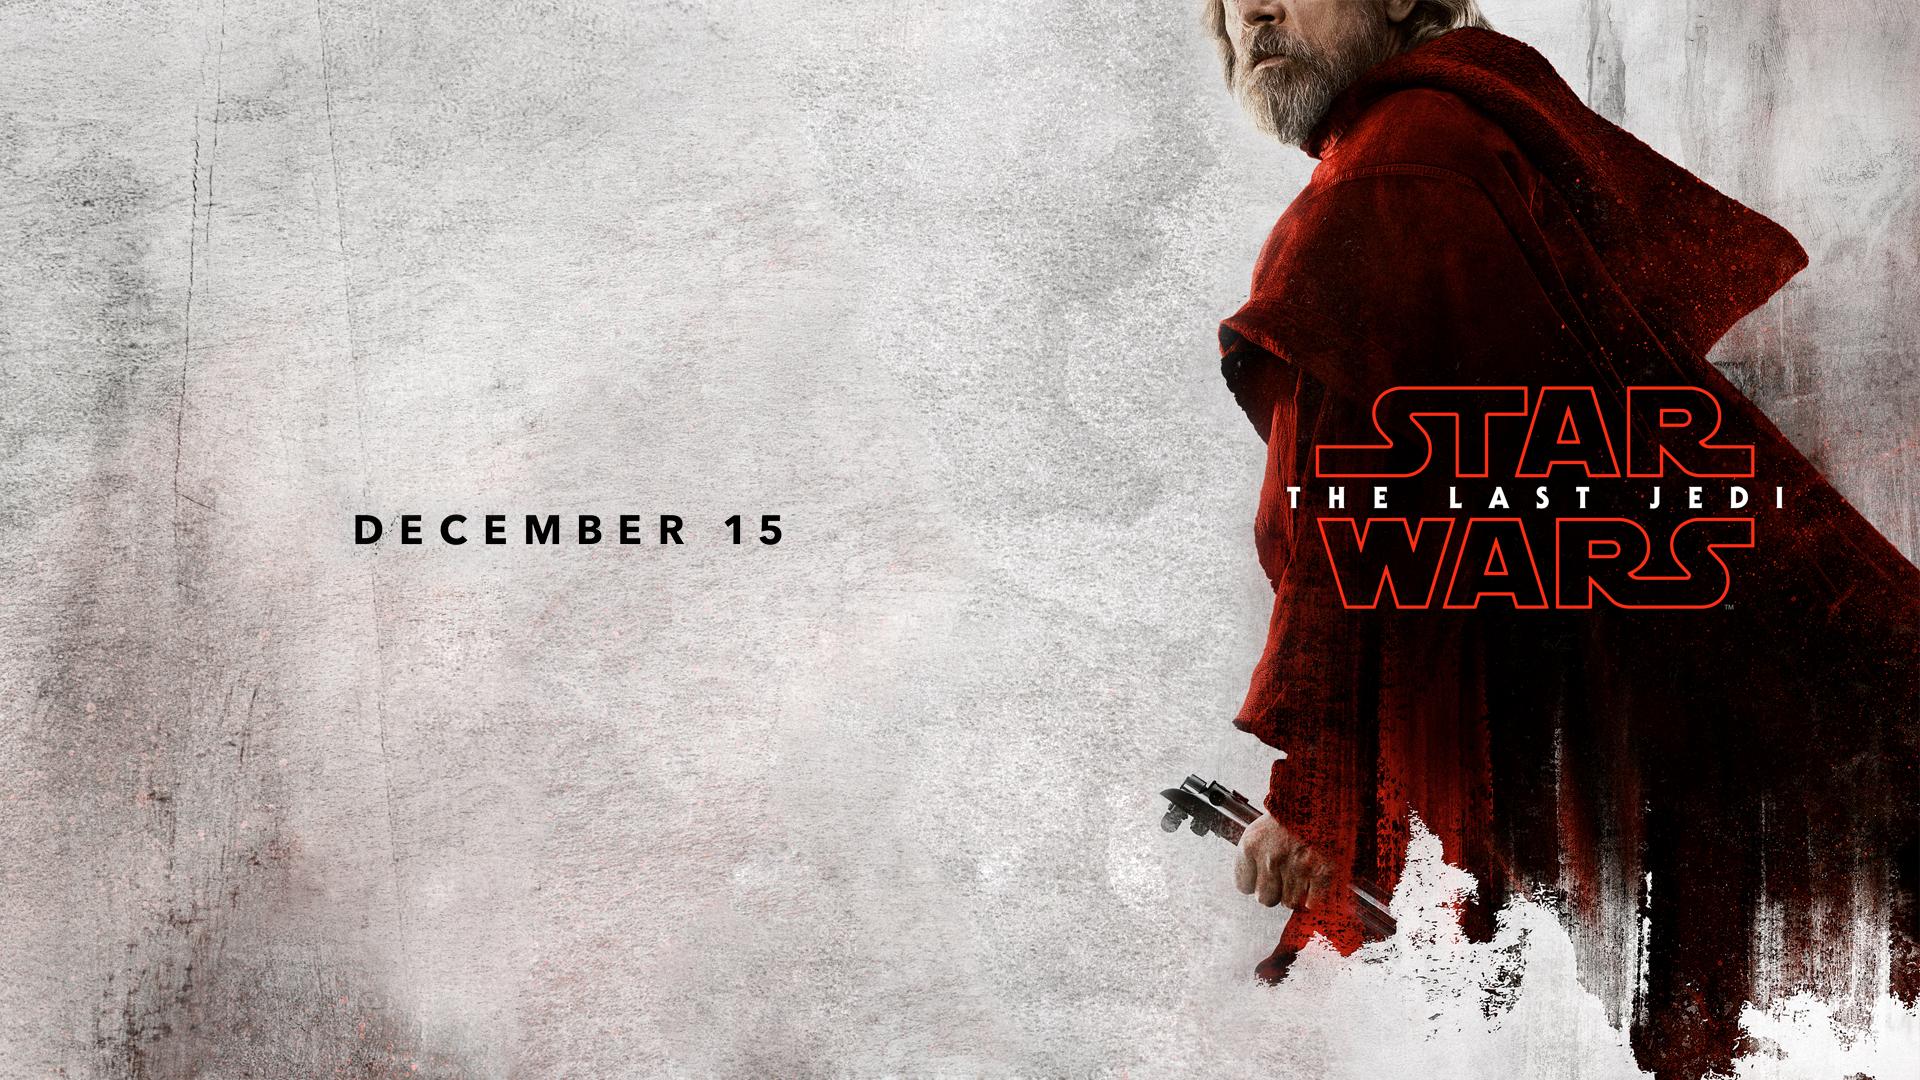 The Last Jedi Luke Skywalker Wallpaper By Spirit Of Adventure On Deviantart